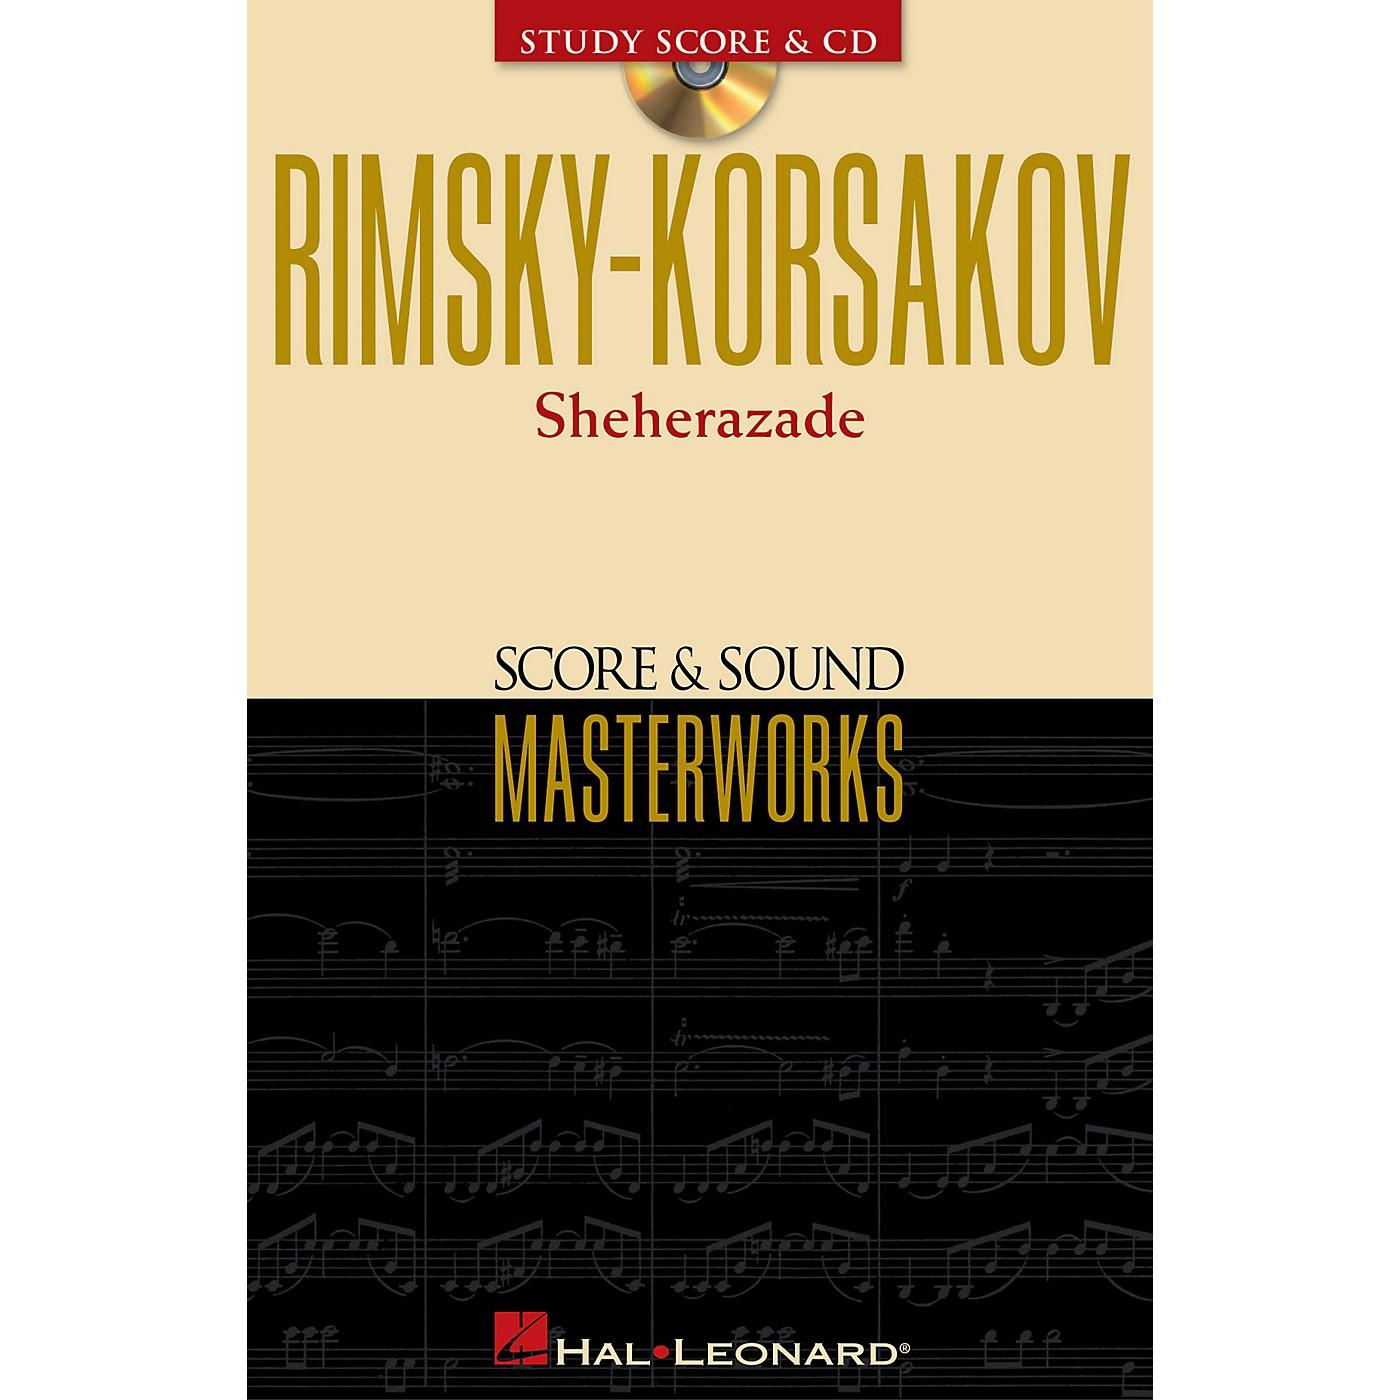 Hal Leonard Rimsky-Korsakov - Sheherazade Study Score with CD Series Softcover with CD by Nikolai Rimsky-Korsakov thumbnail